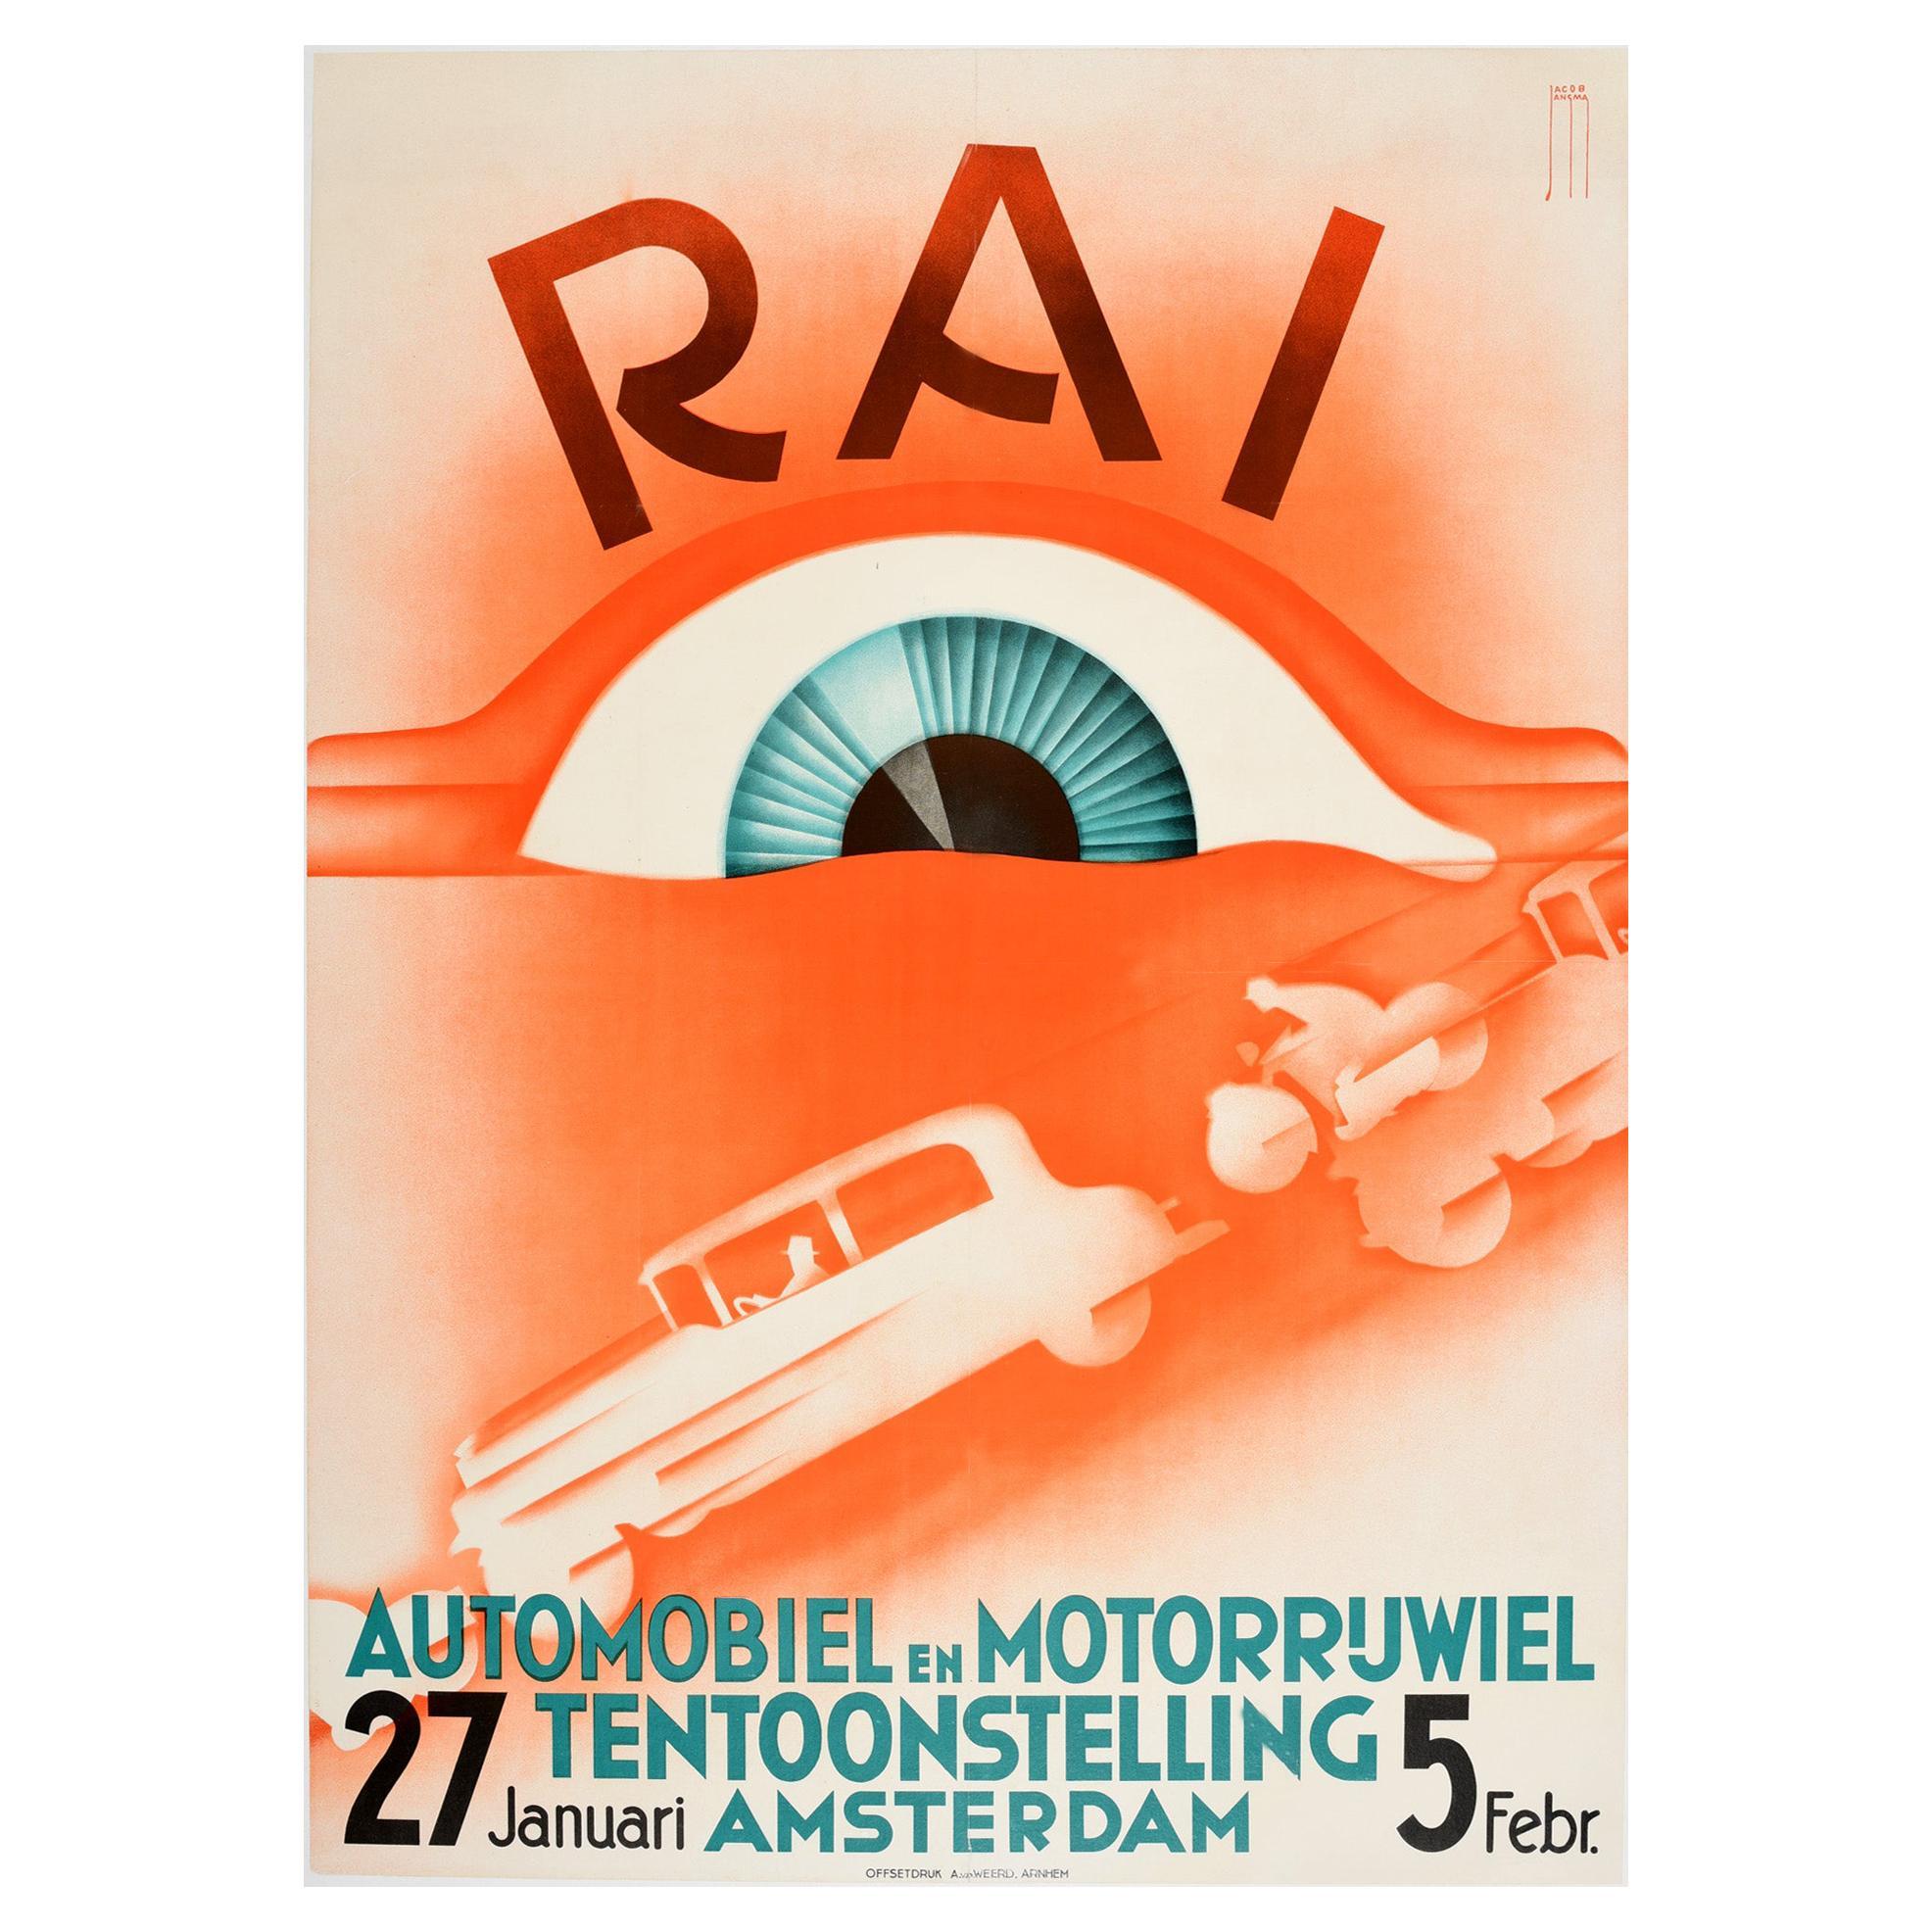 Original Vintage Art Deco Design Motor Show Poster RAI Automobiel & Motorrijwiel